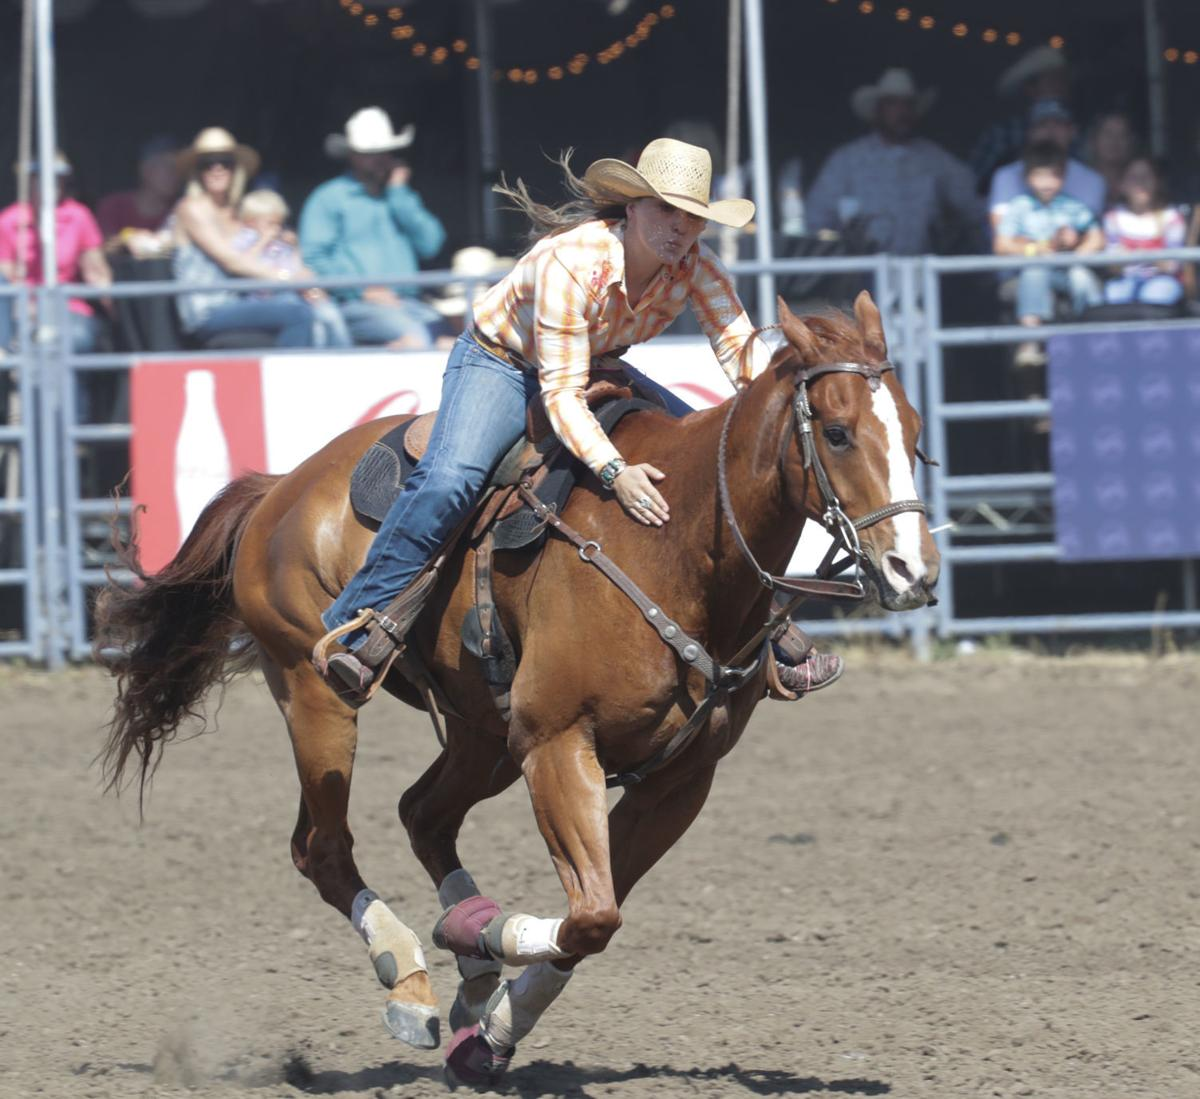 060318 Elks Rodeo Sunday 05.jpg